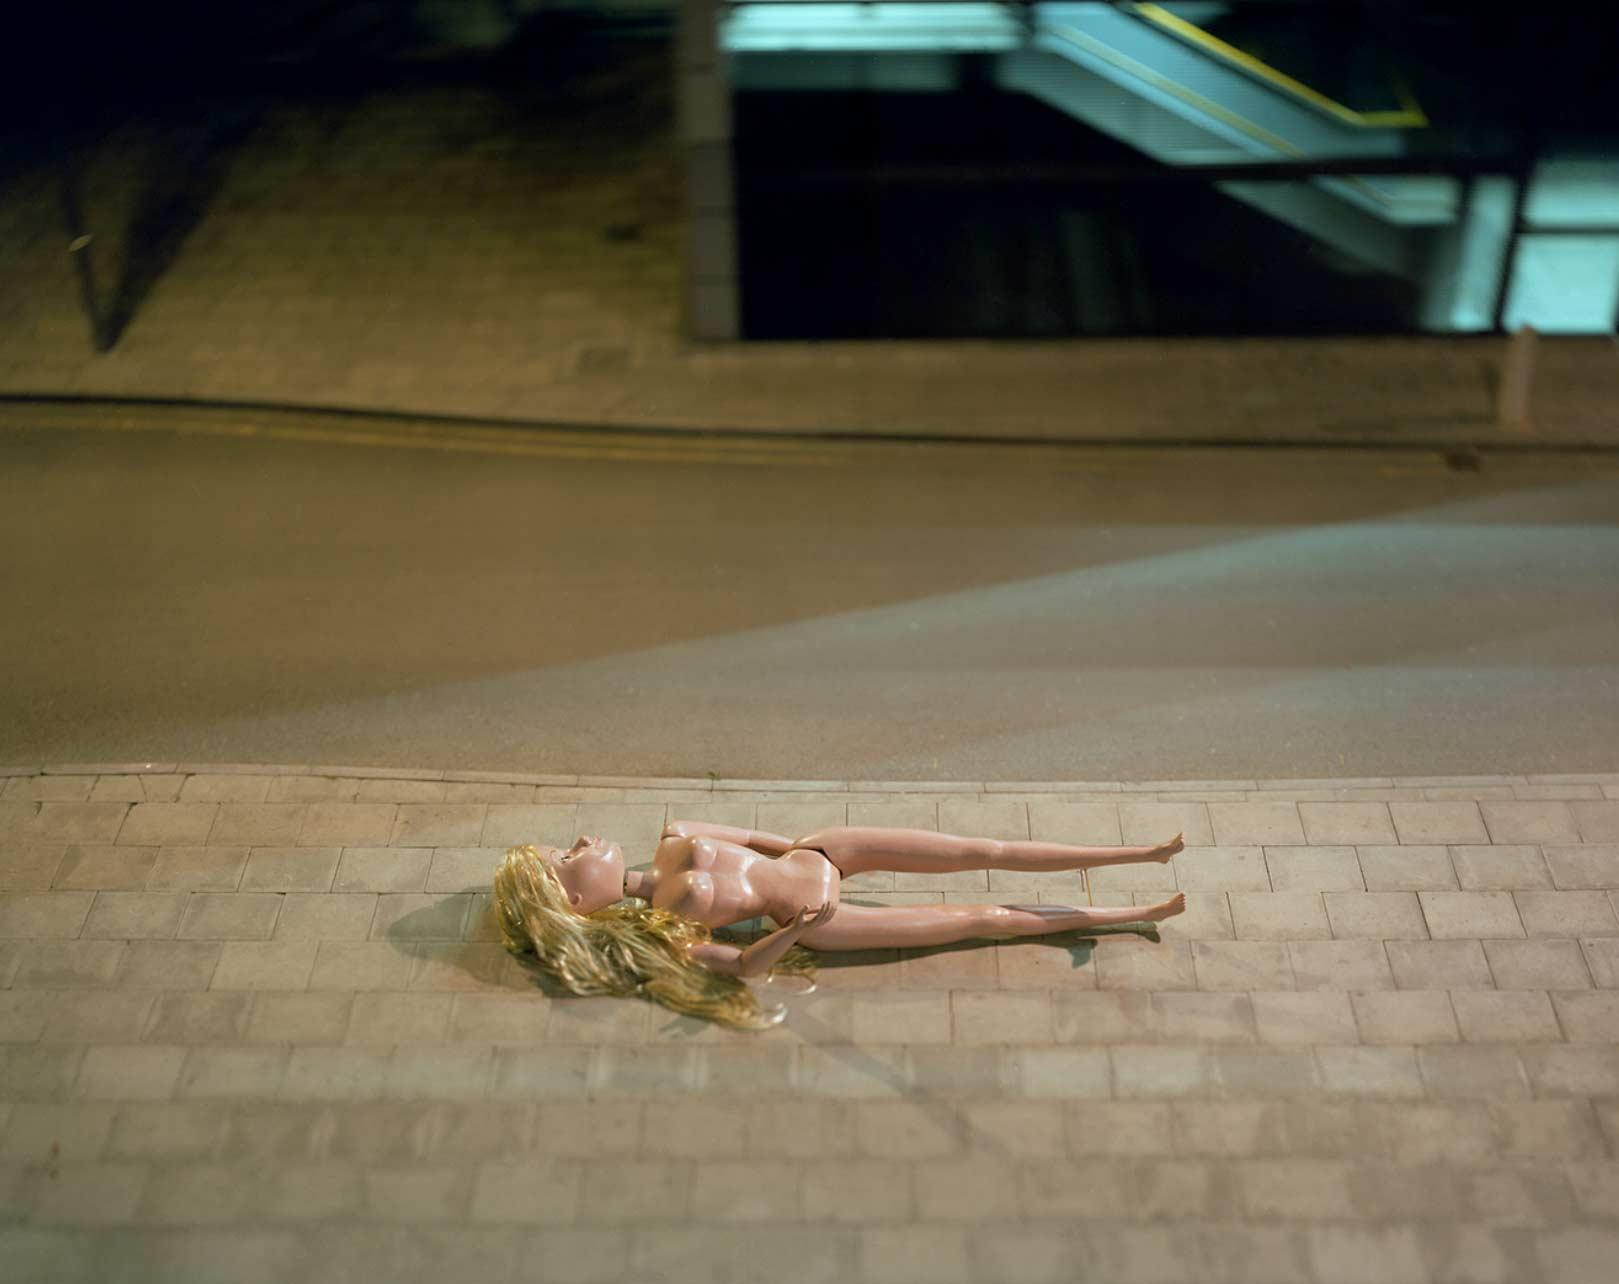 Angriff der 6-Meter-Barbies Michael-John-Hunter-Doll_02